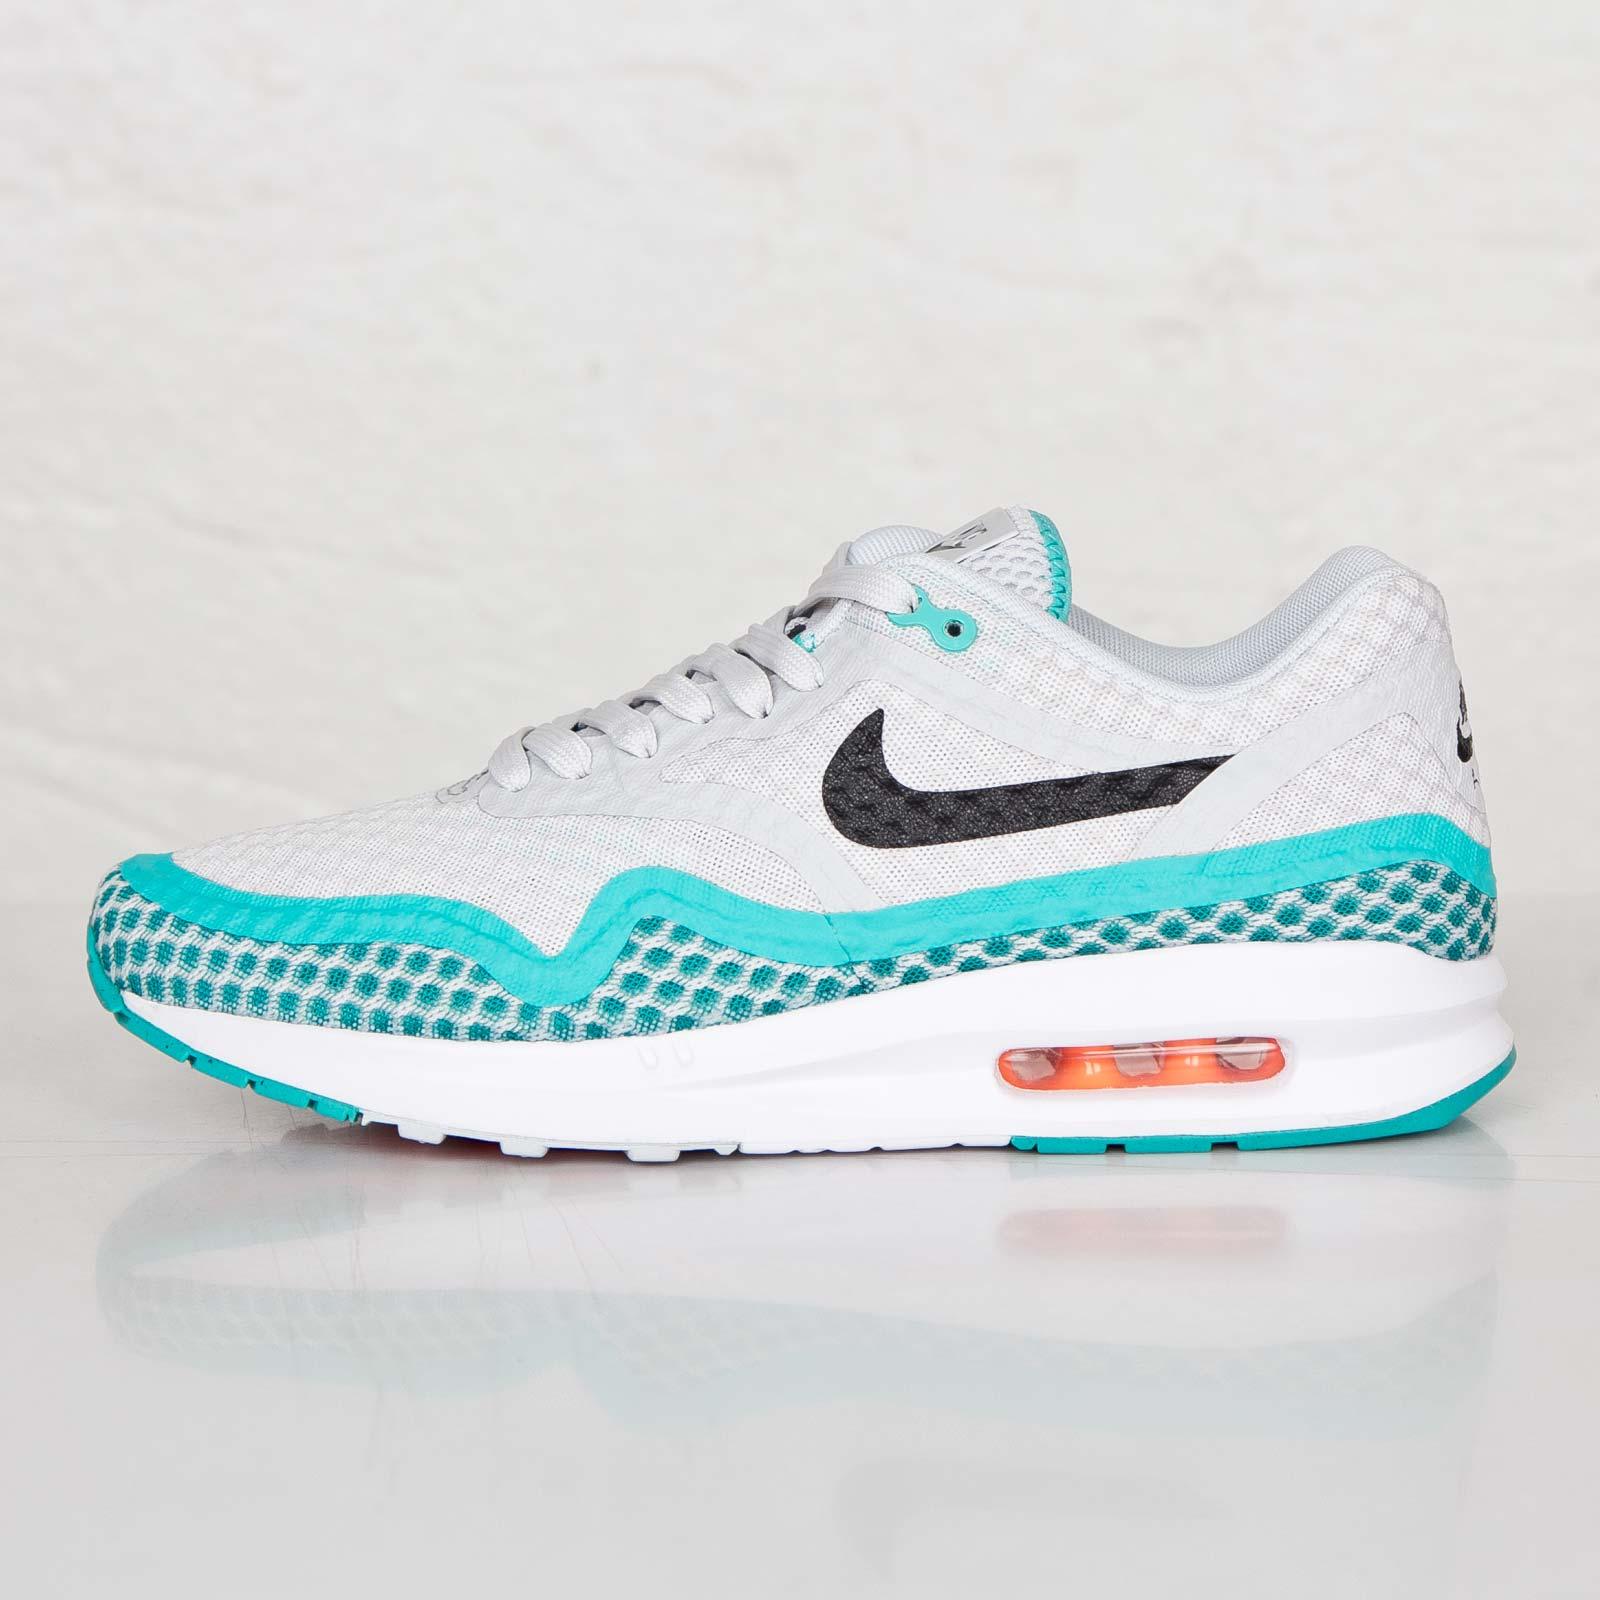 Nike Air Max Lunar1 Breeze 684808 002 Sneakersnstuff